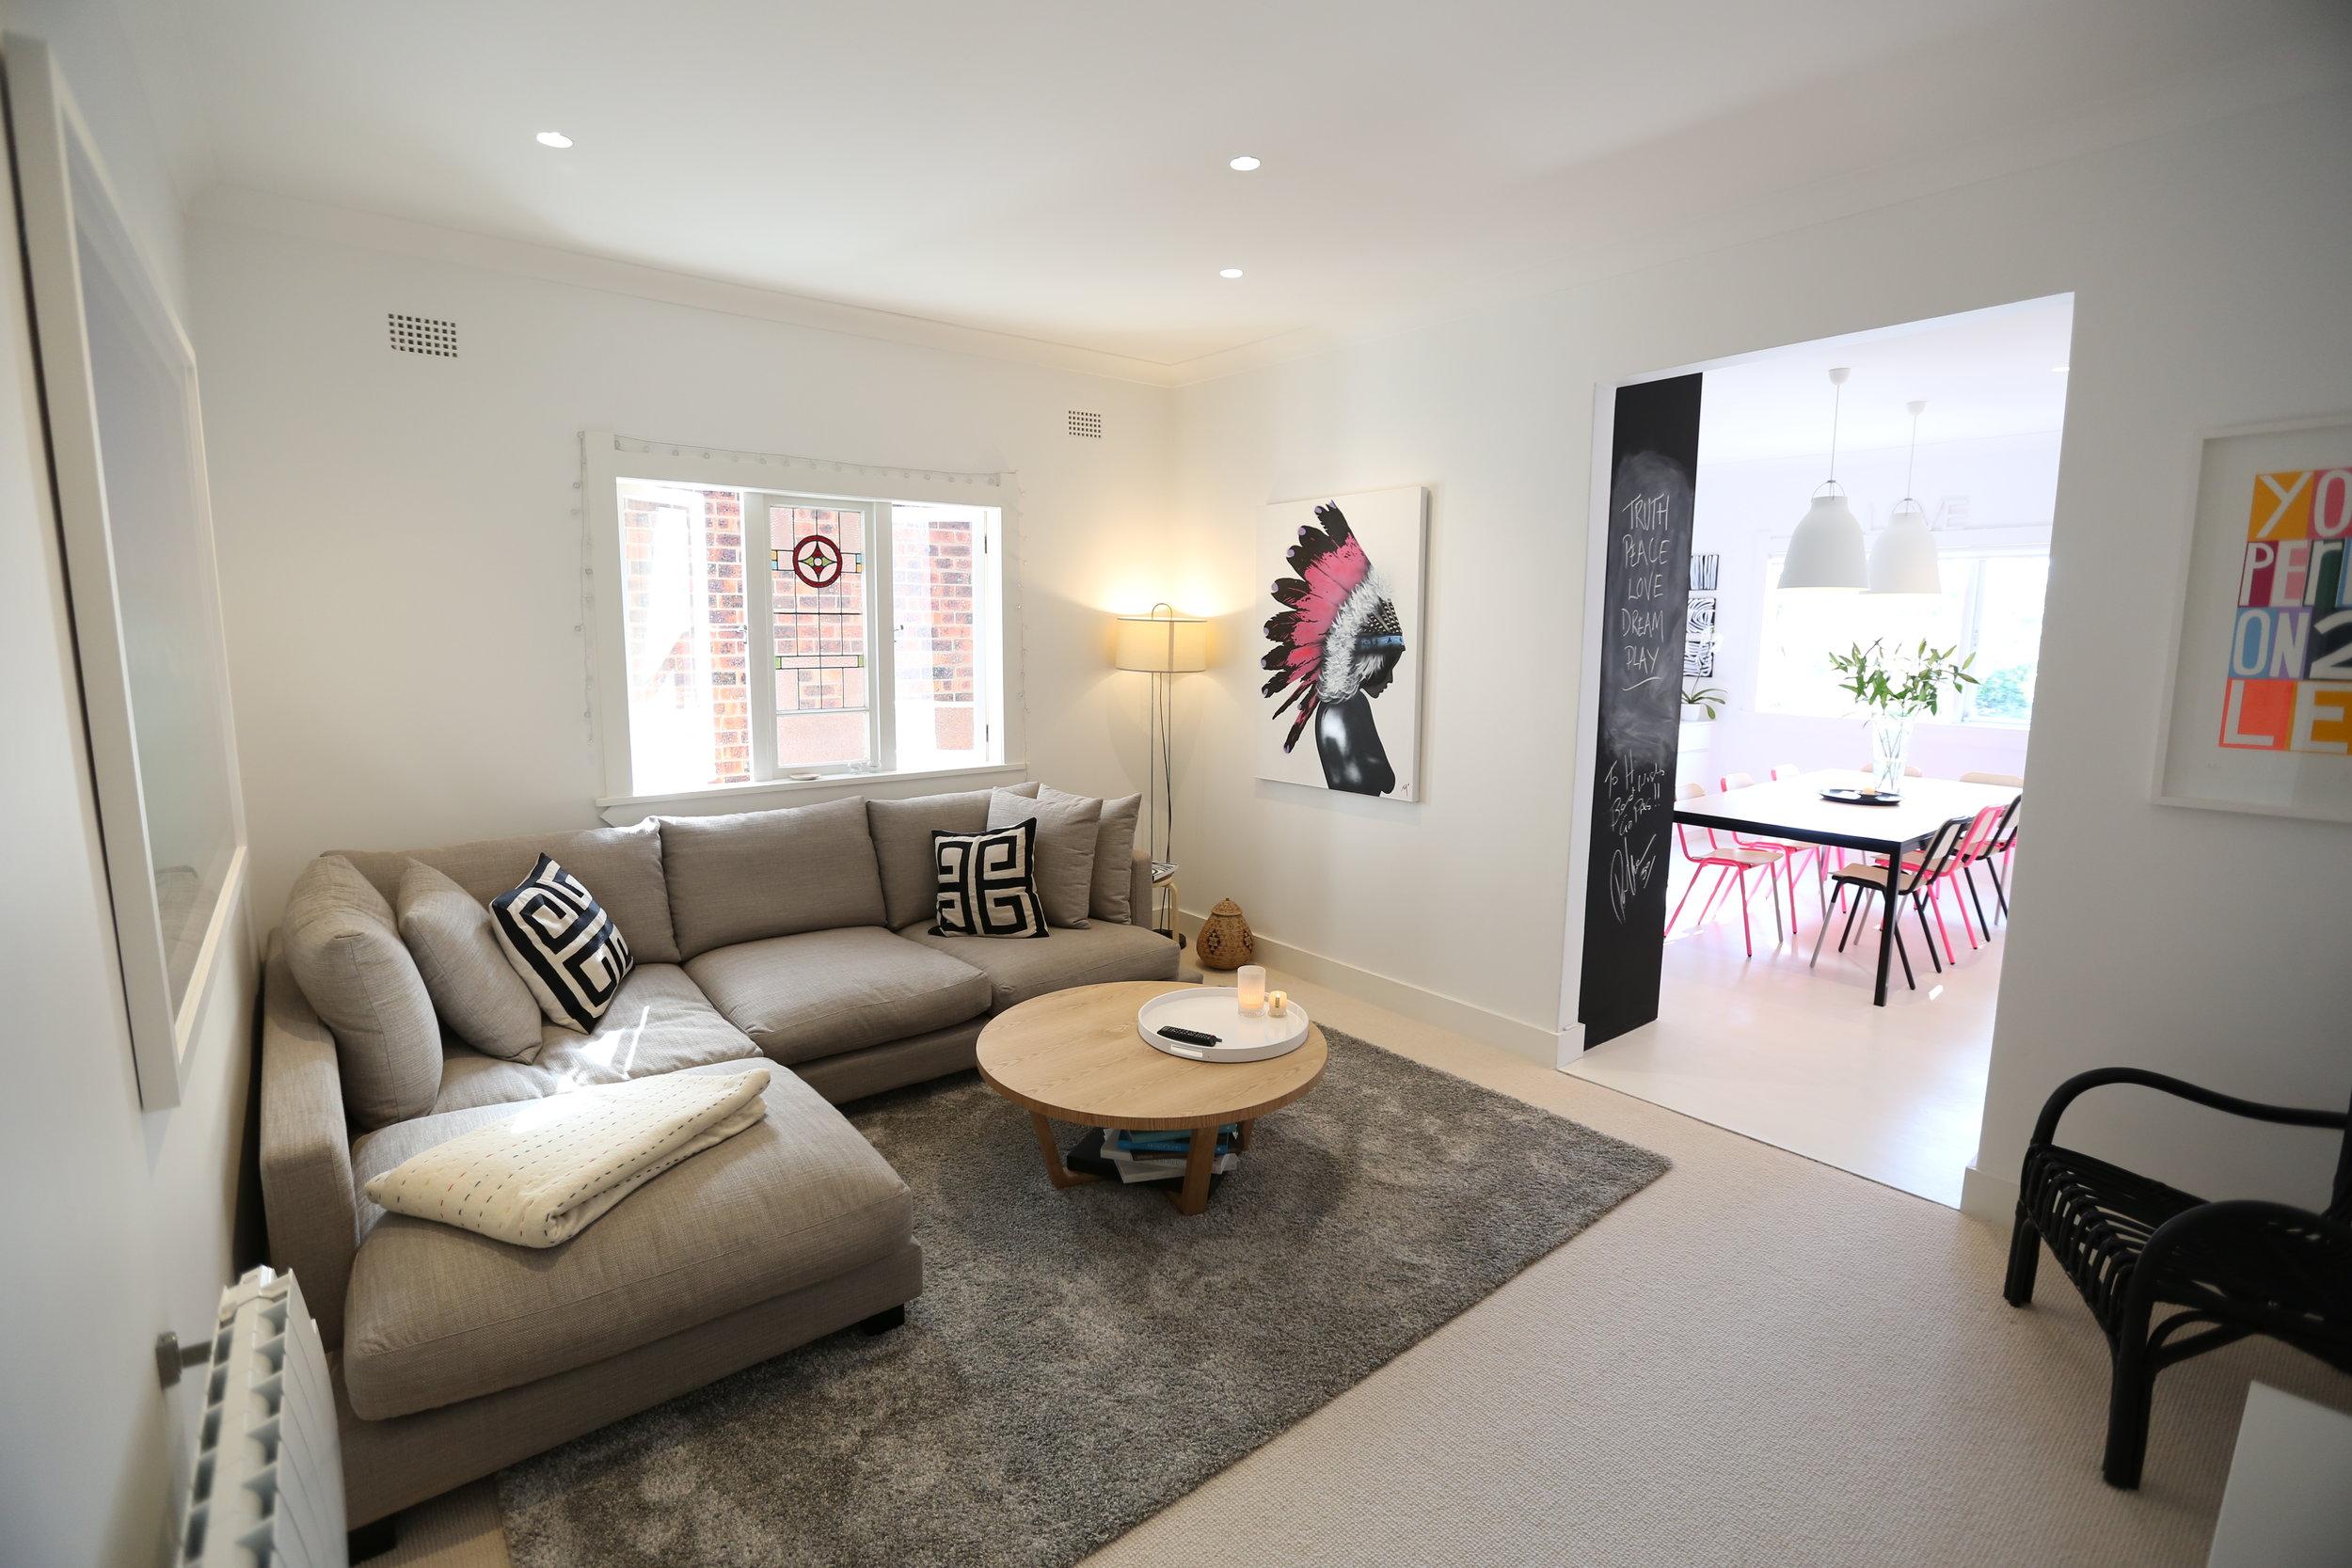 Living Room1 copy.JPG